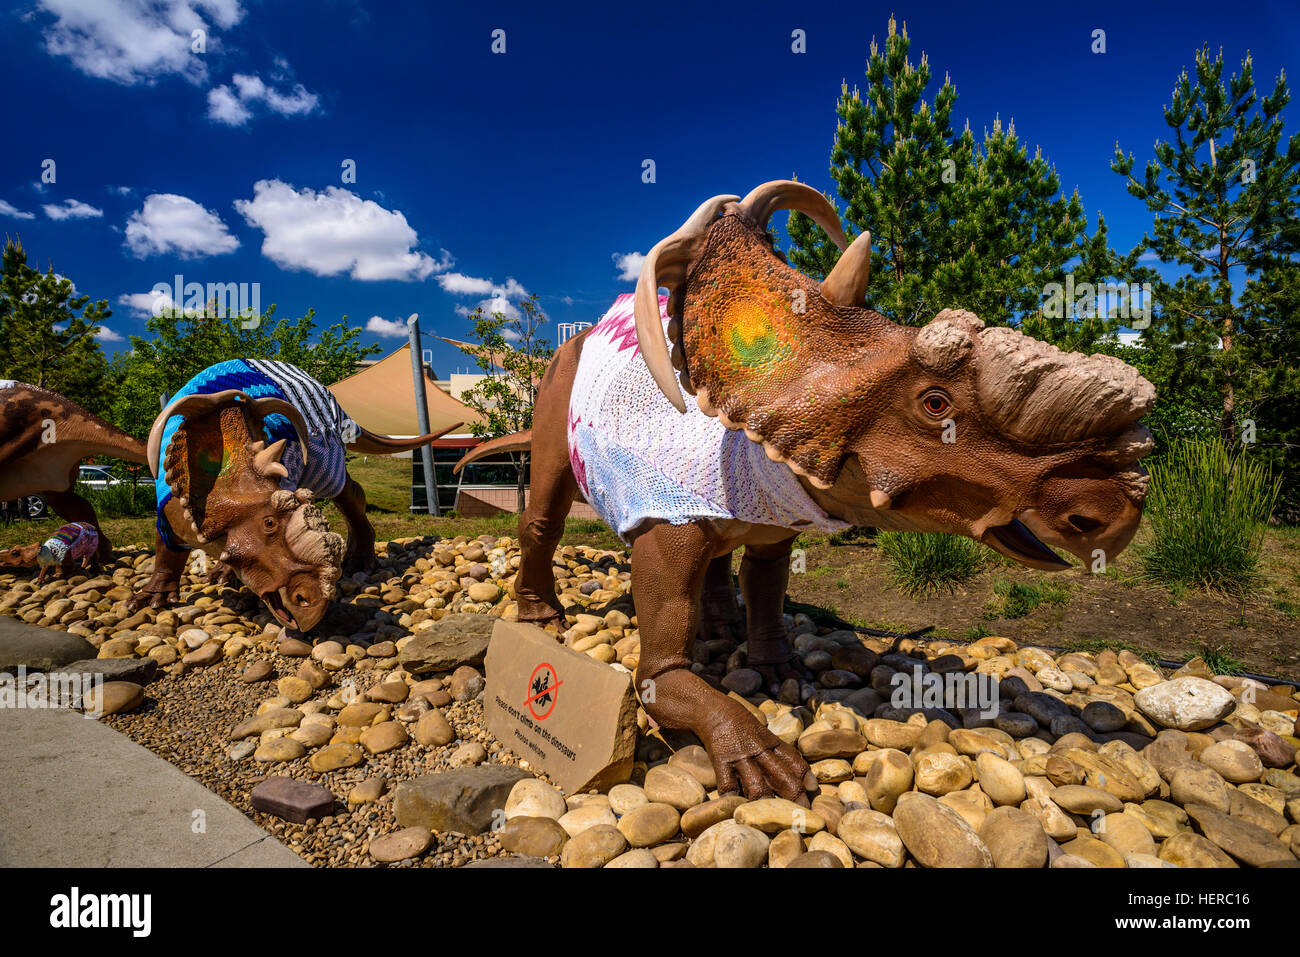 Kanada, Alberta, Canadian Badlands, Red Deer River Valley, Drumheller, Royal Tyrrell Museum of Palaeontology, Dinosaurierskulptur - Stock Image